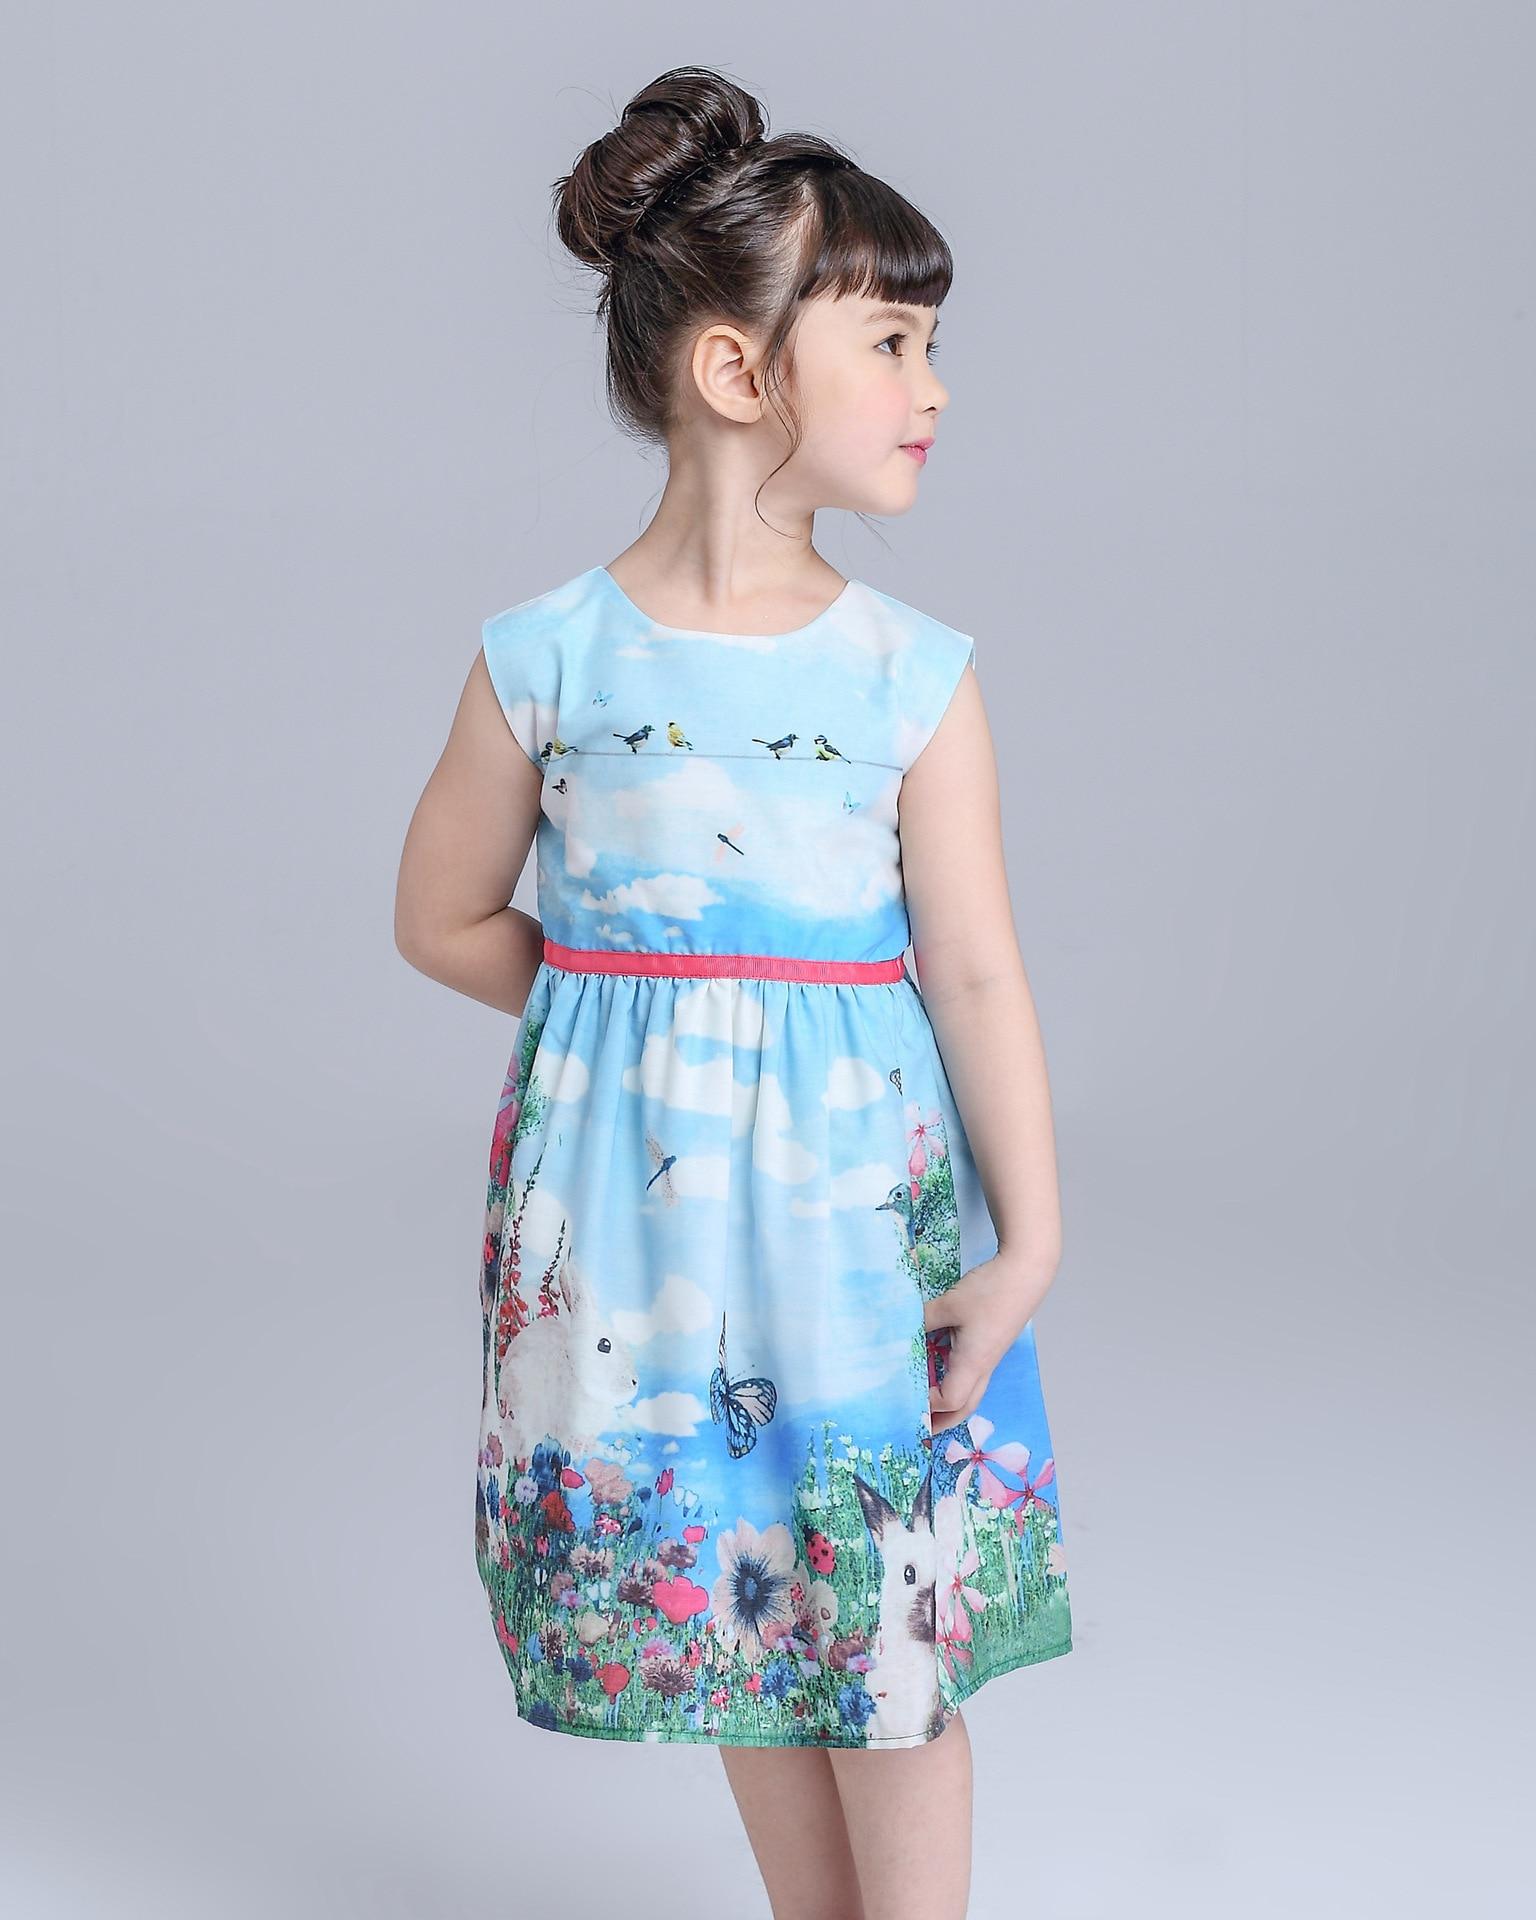 Baby Girl Clothes Kids Children Dresses Flowers Sweet Lovely Rabbit Cartoon Blue Princess Dresses Sleeveless Summer<br>